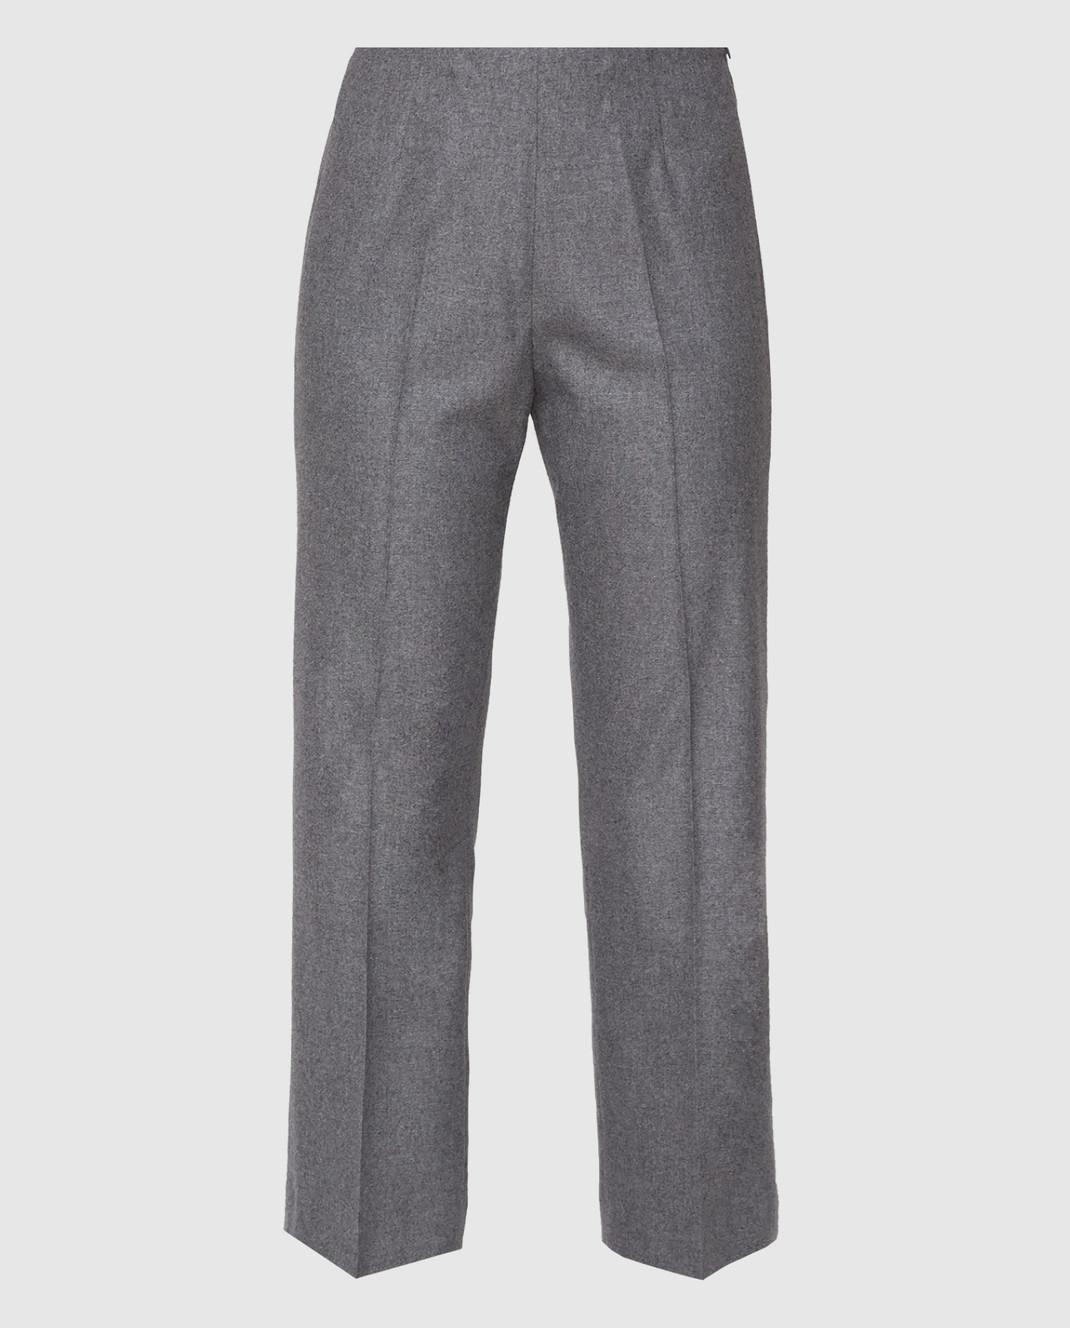 COLOMBO Серые брюки PA0032661088